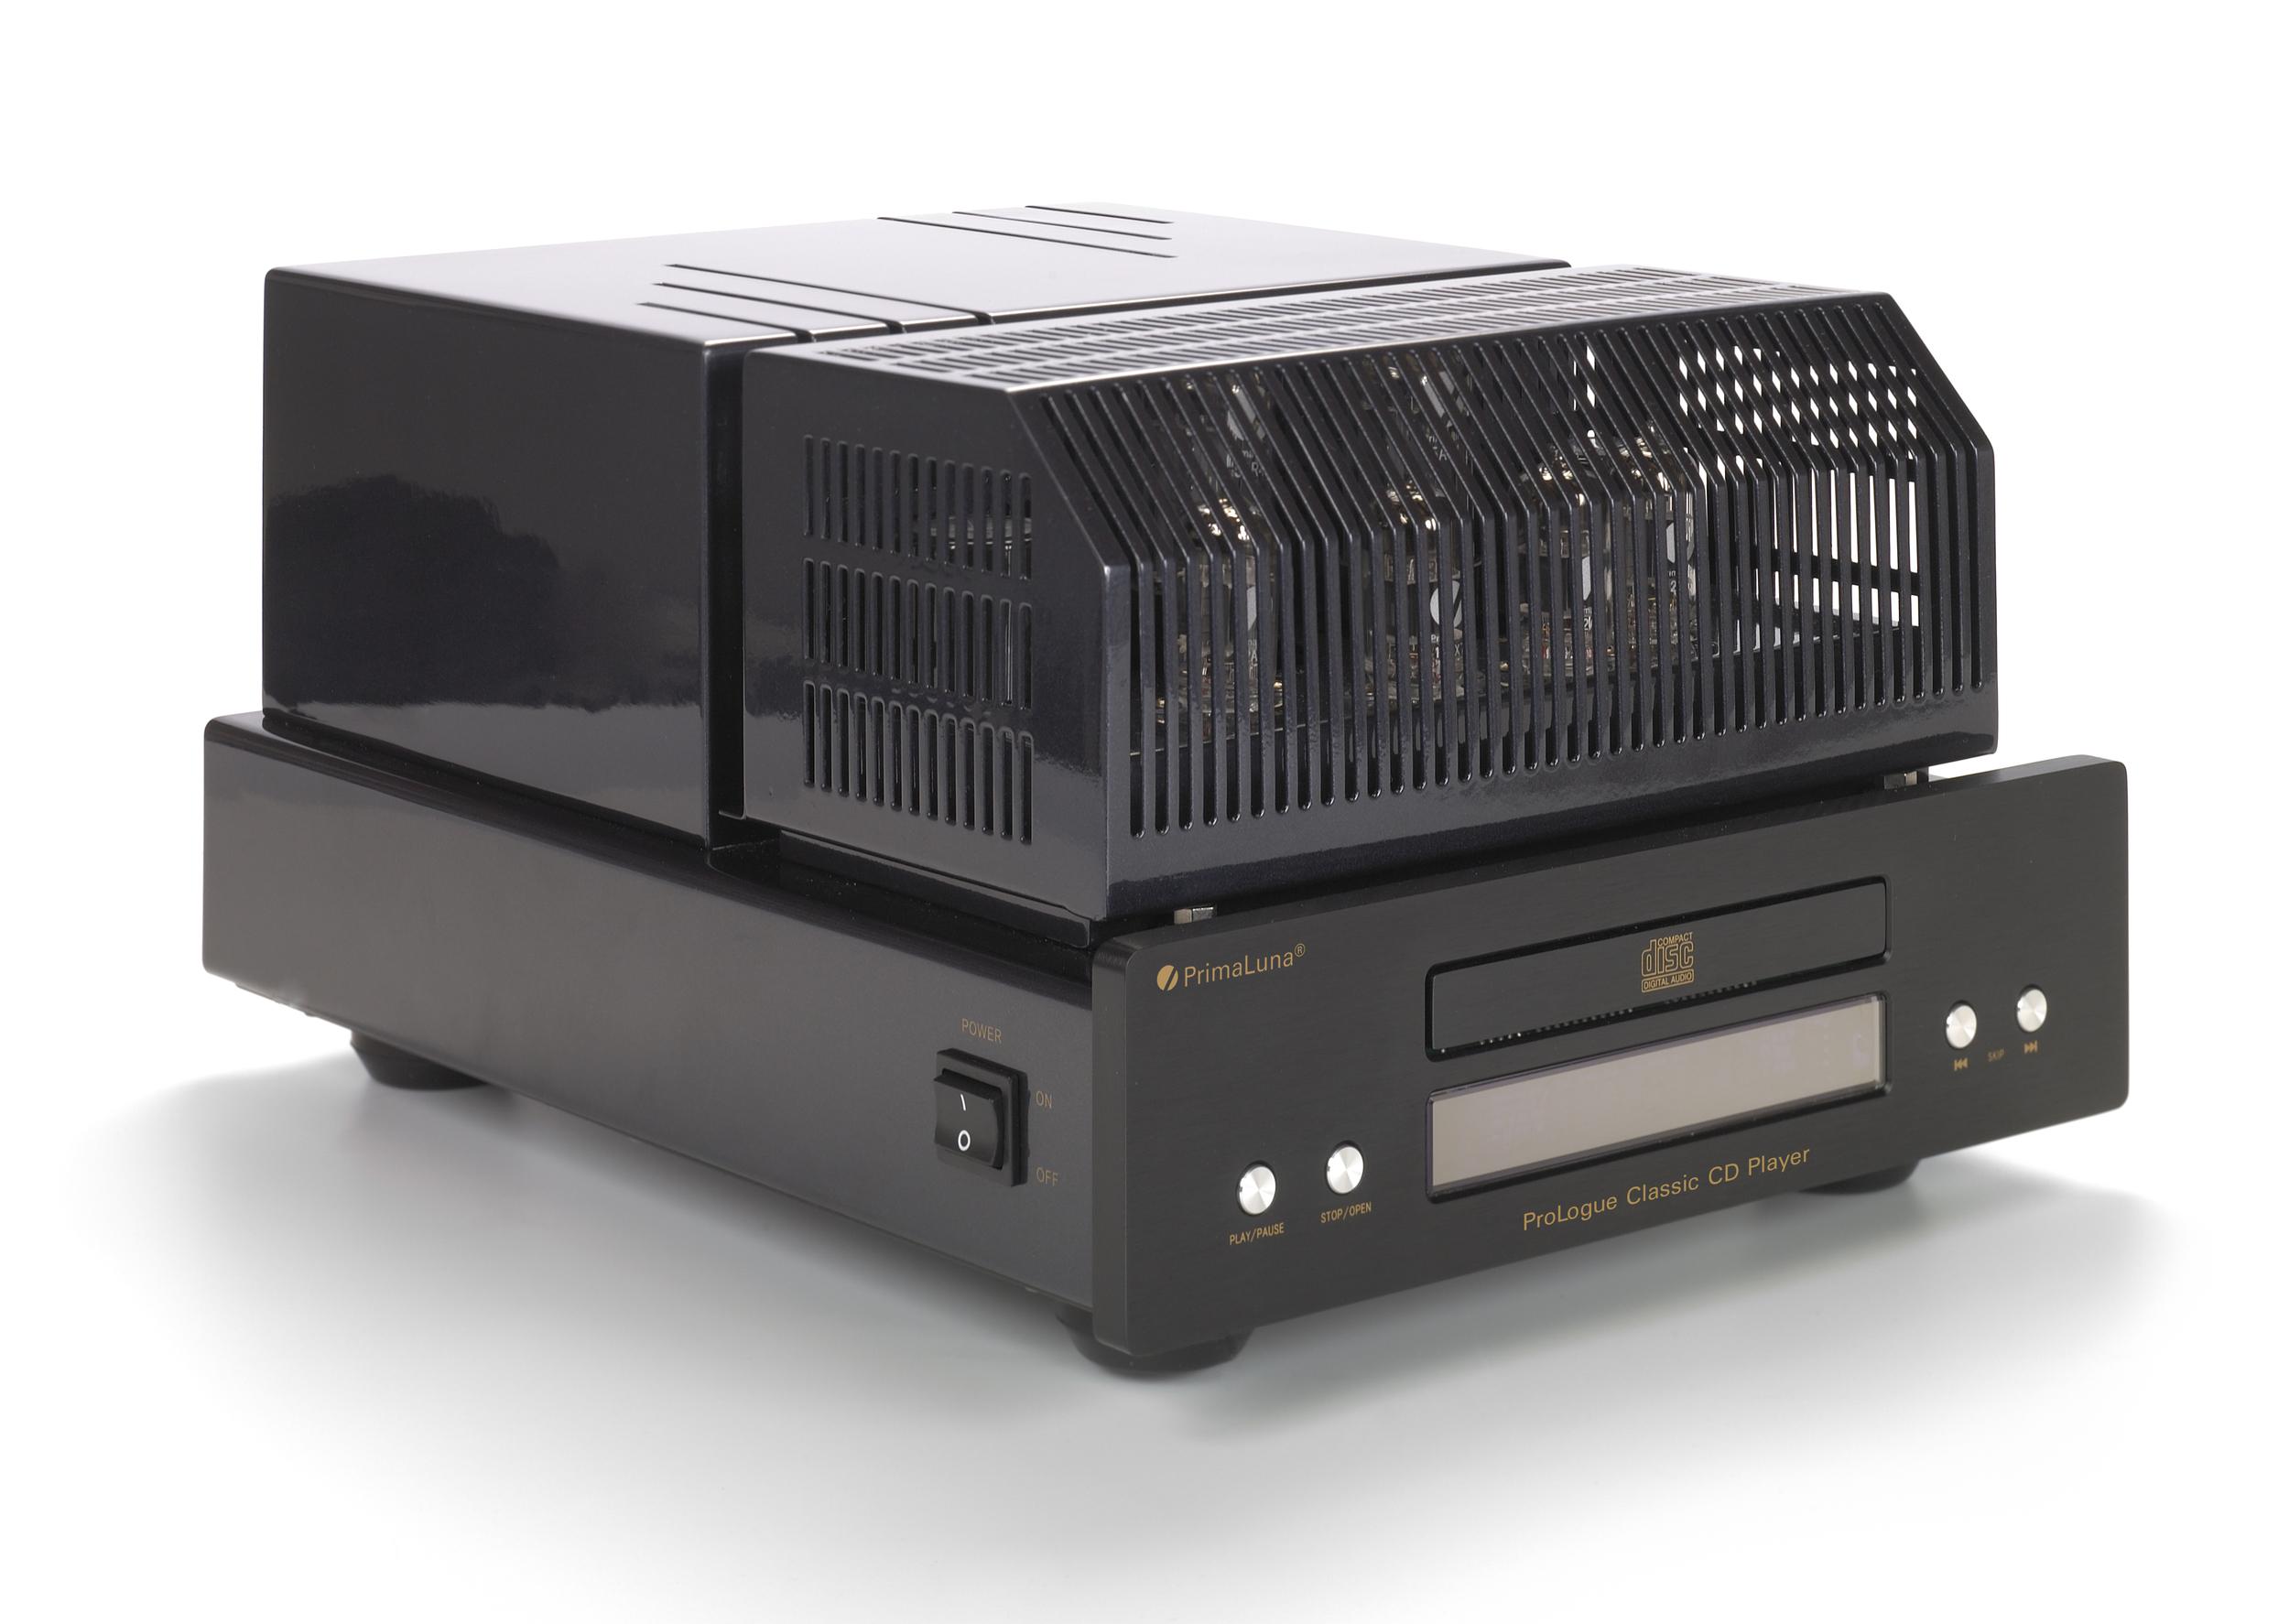 004-PrimaLuna Classic CD Player-zwart.jpg